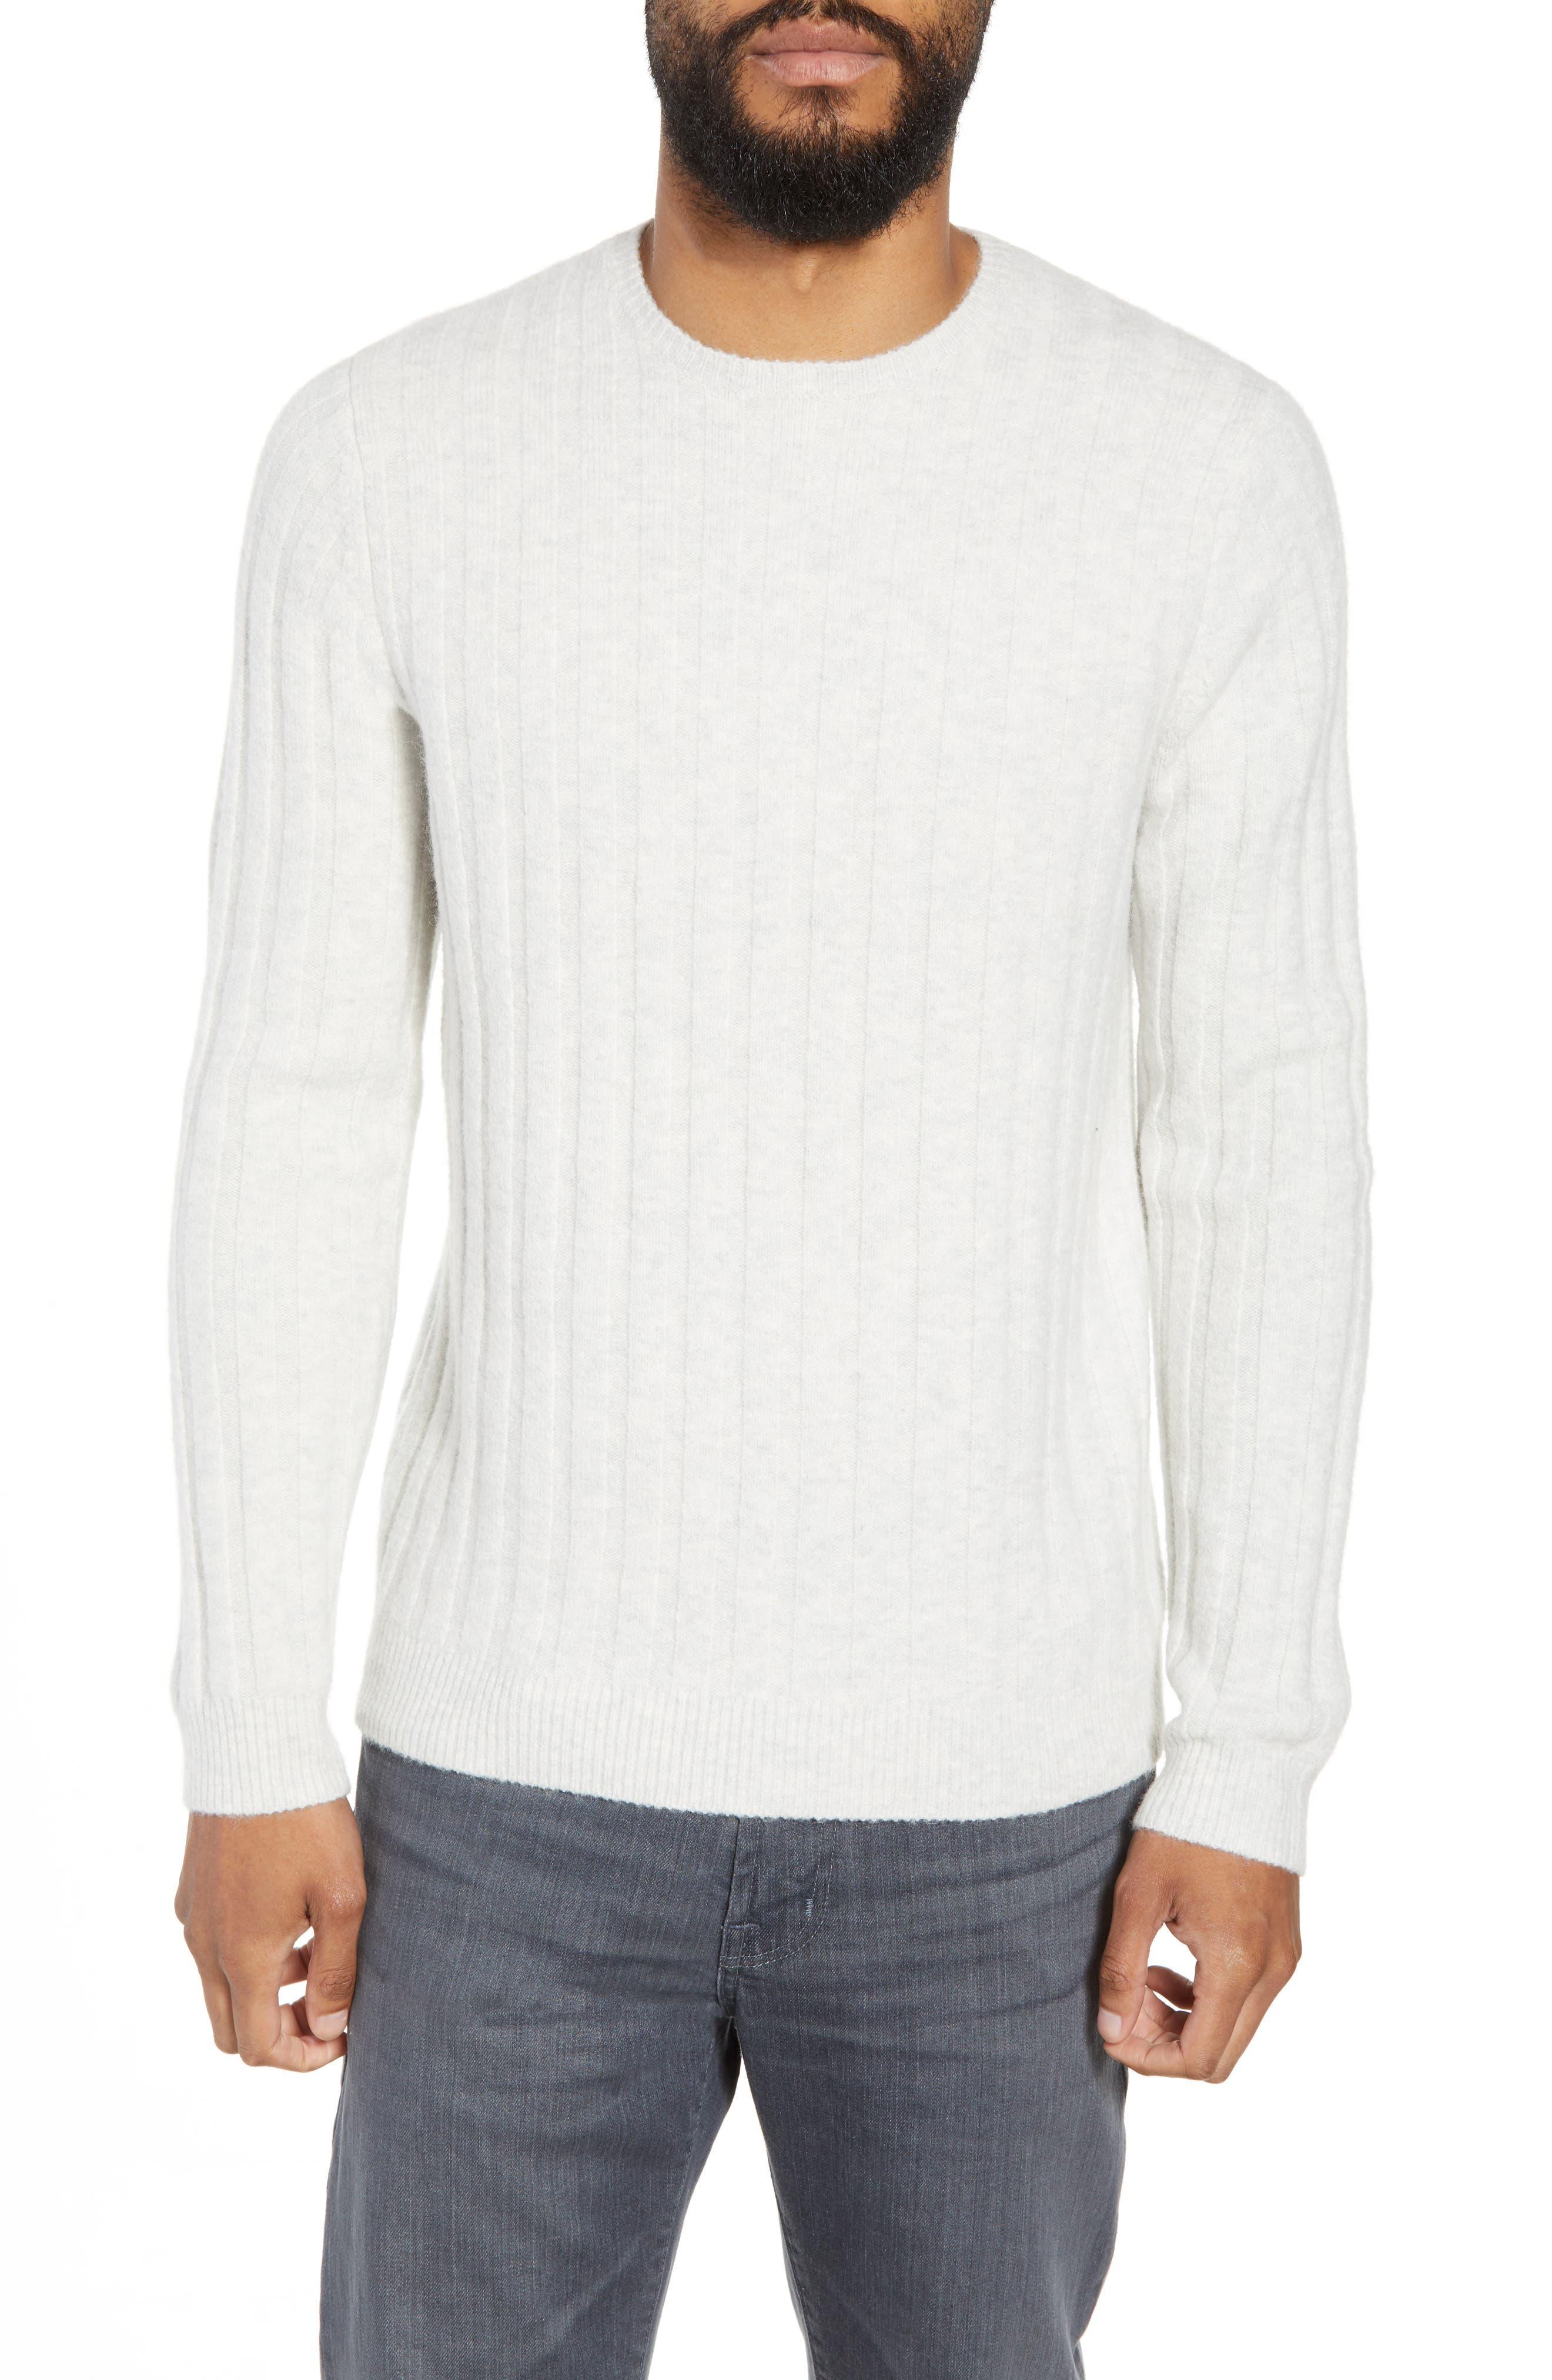 Rib Crewneck Sweater,                             Main thumbnail 1, color,                             GREY SILK HEATHER